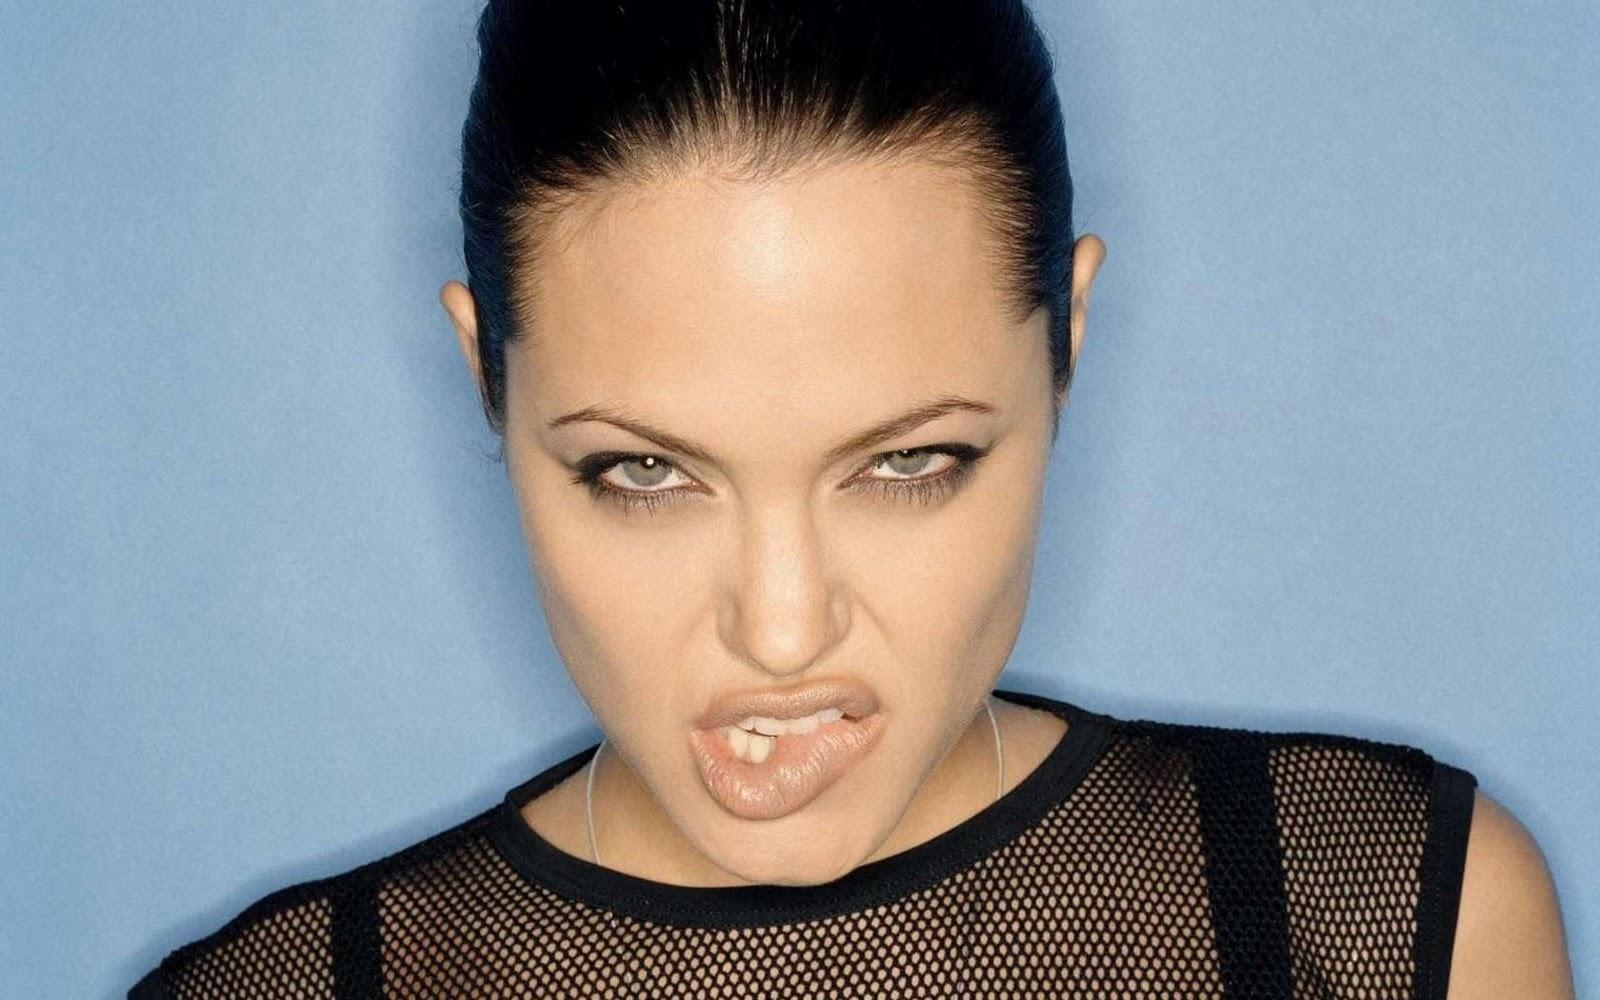 http://1.bp.blogspot.com/-yuSM3-0Ebcs/Tq5qe1YYWSI/AAAAAAAAAus/VrkpPi6tCZI/s1600/Angelina-Jolie-sexy-sheer-biting-lip.jpg